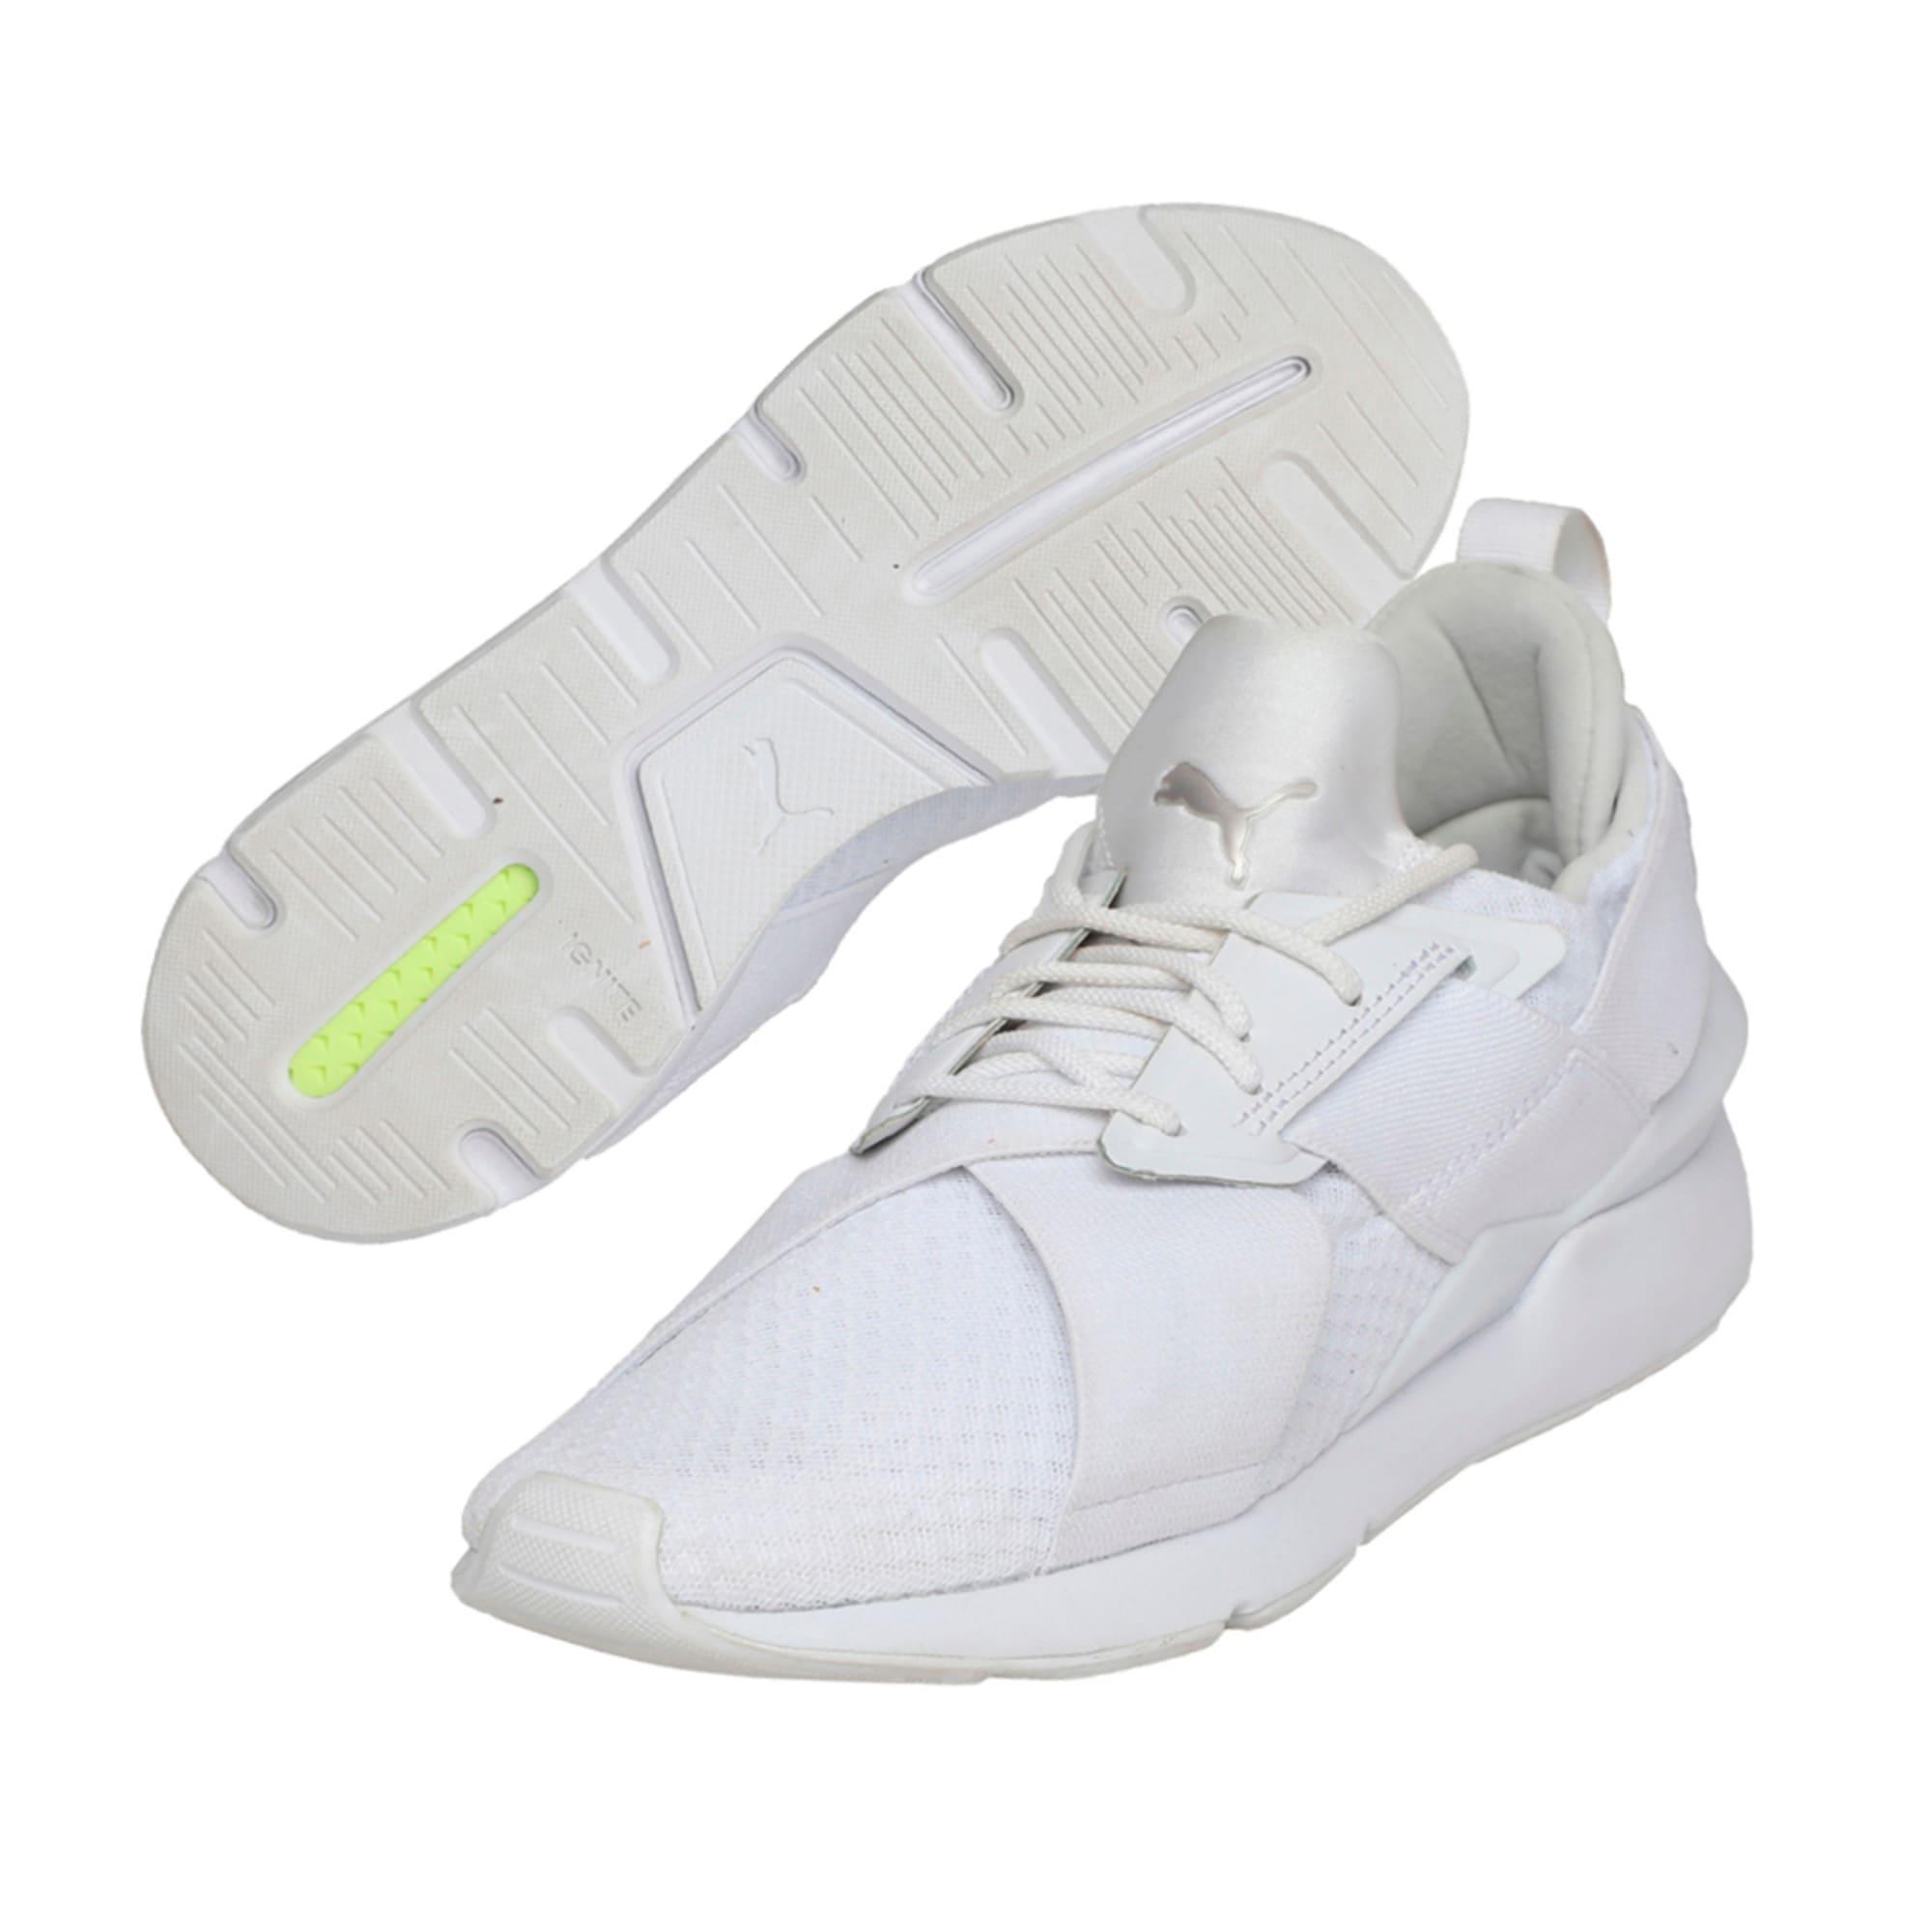 Thumbnail 6 of Muse En Pointe Women's Shoes, Puma White-Puma White, medium-IND